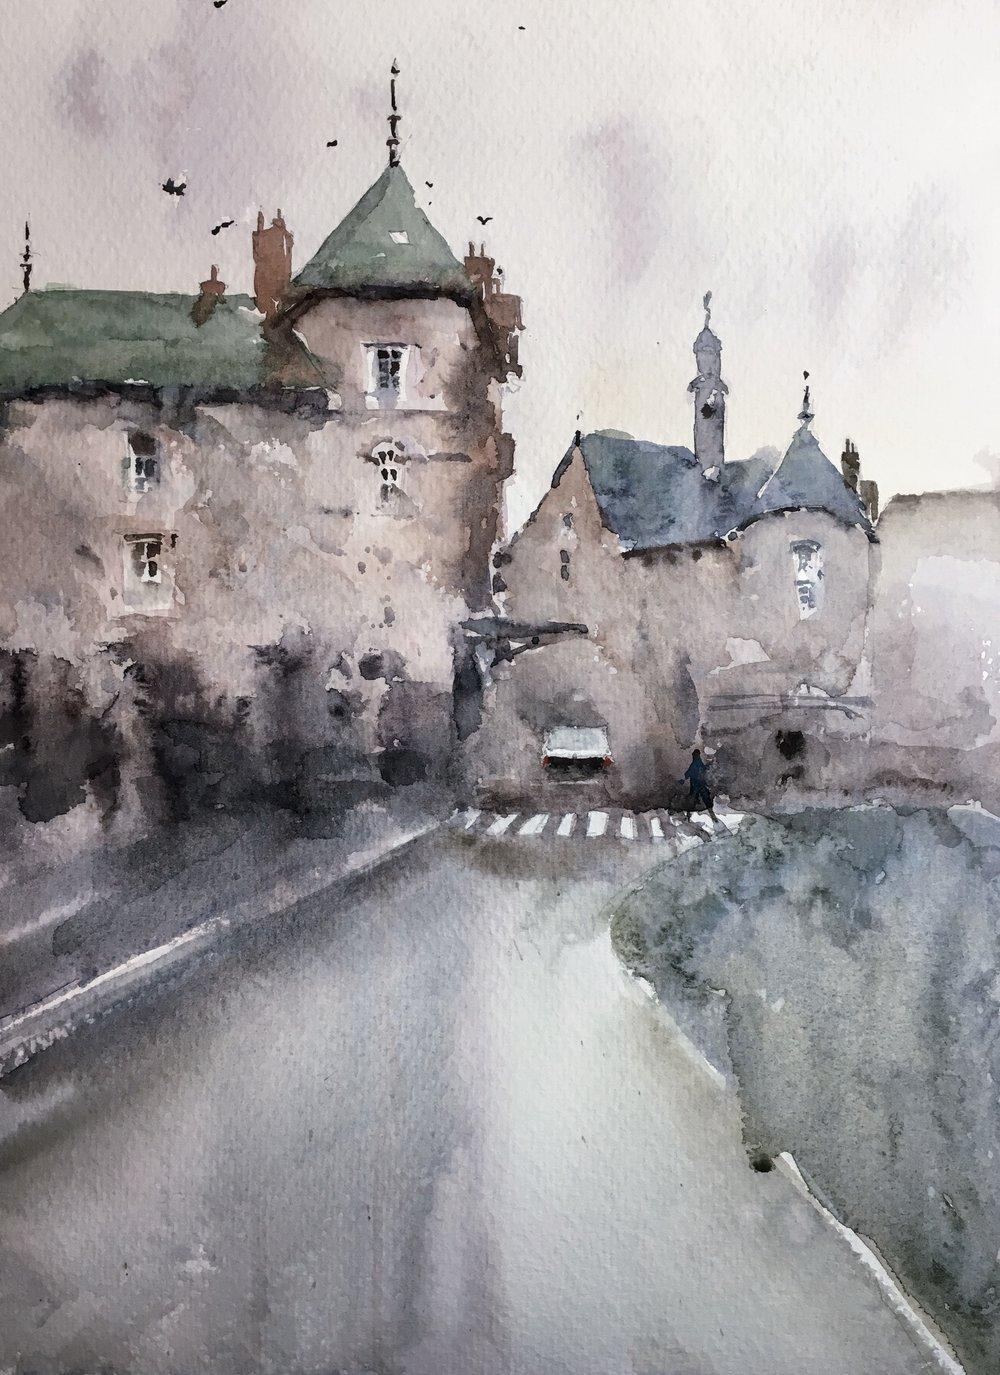 zbuvic_practice_watercolor.JPG